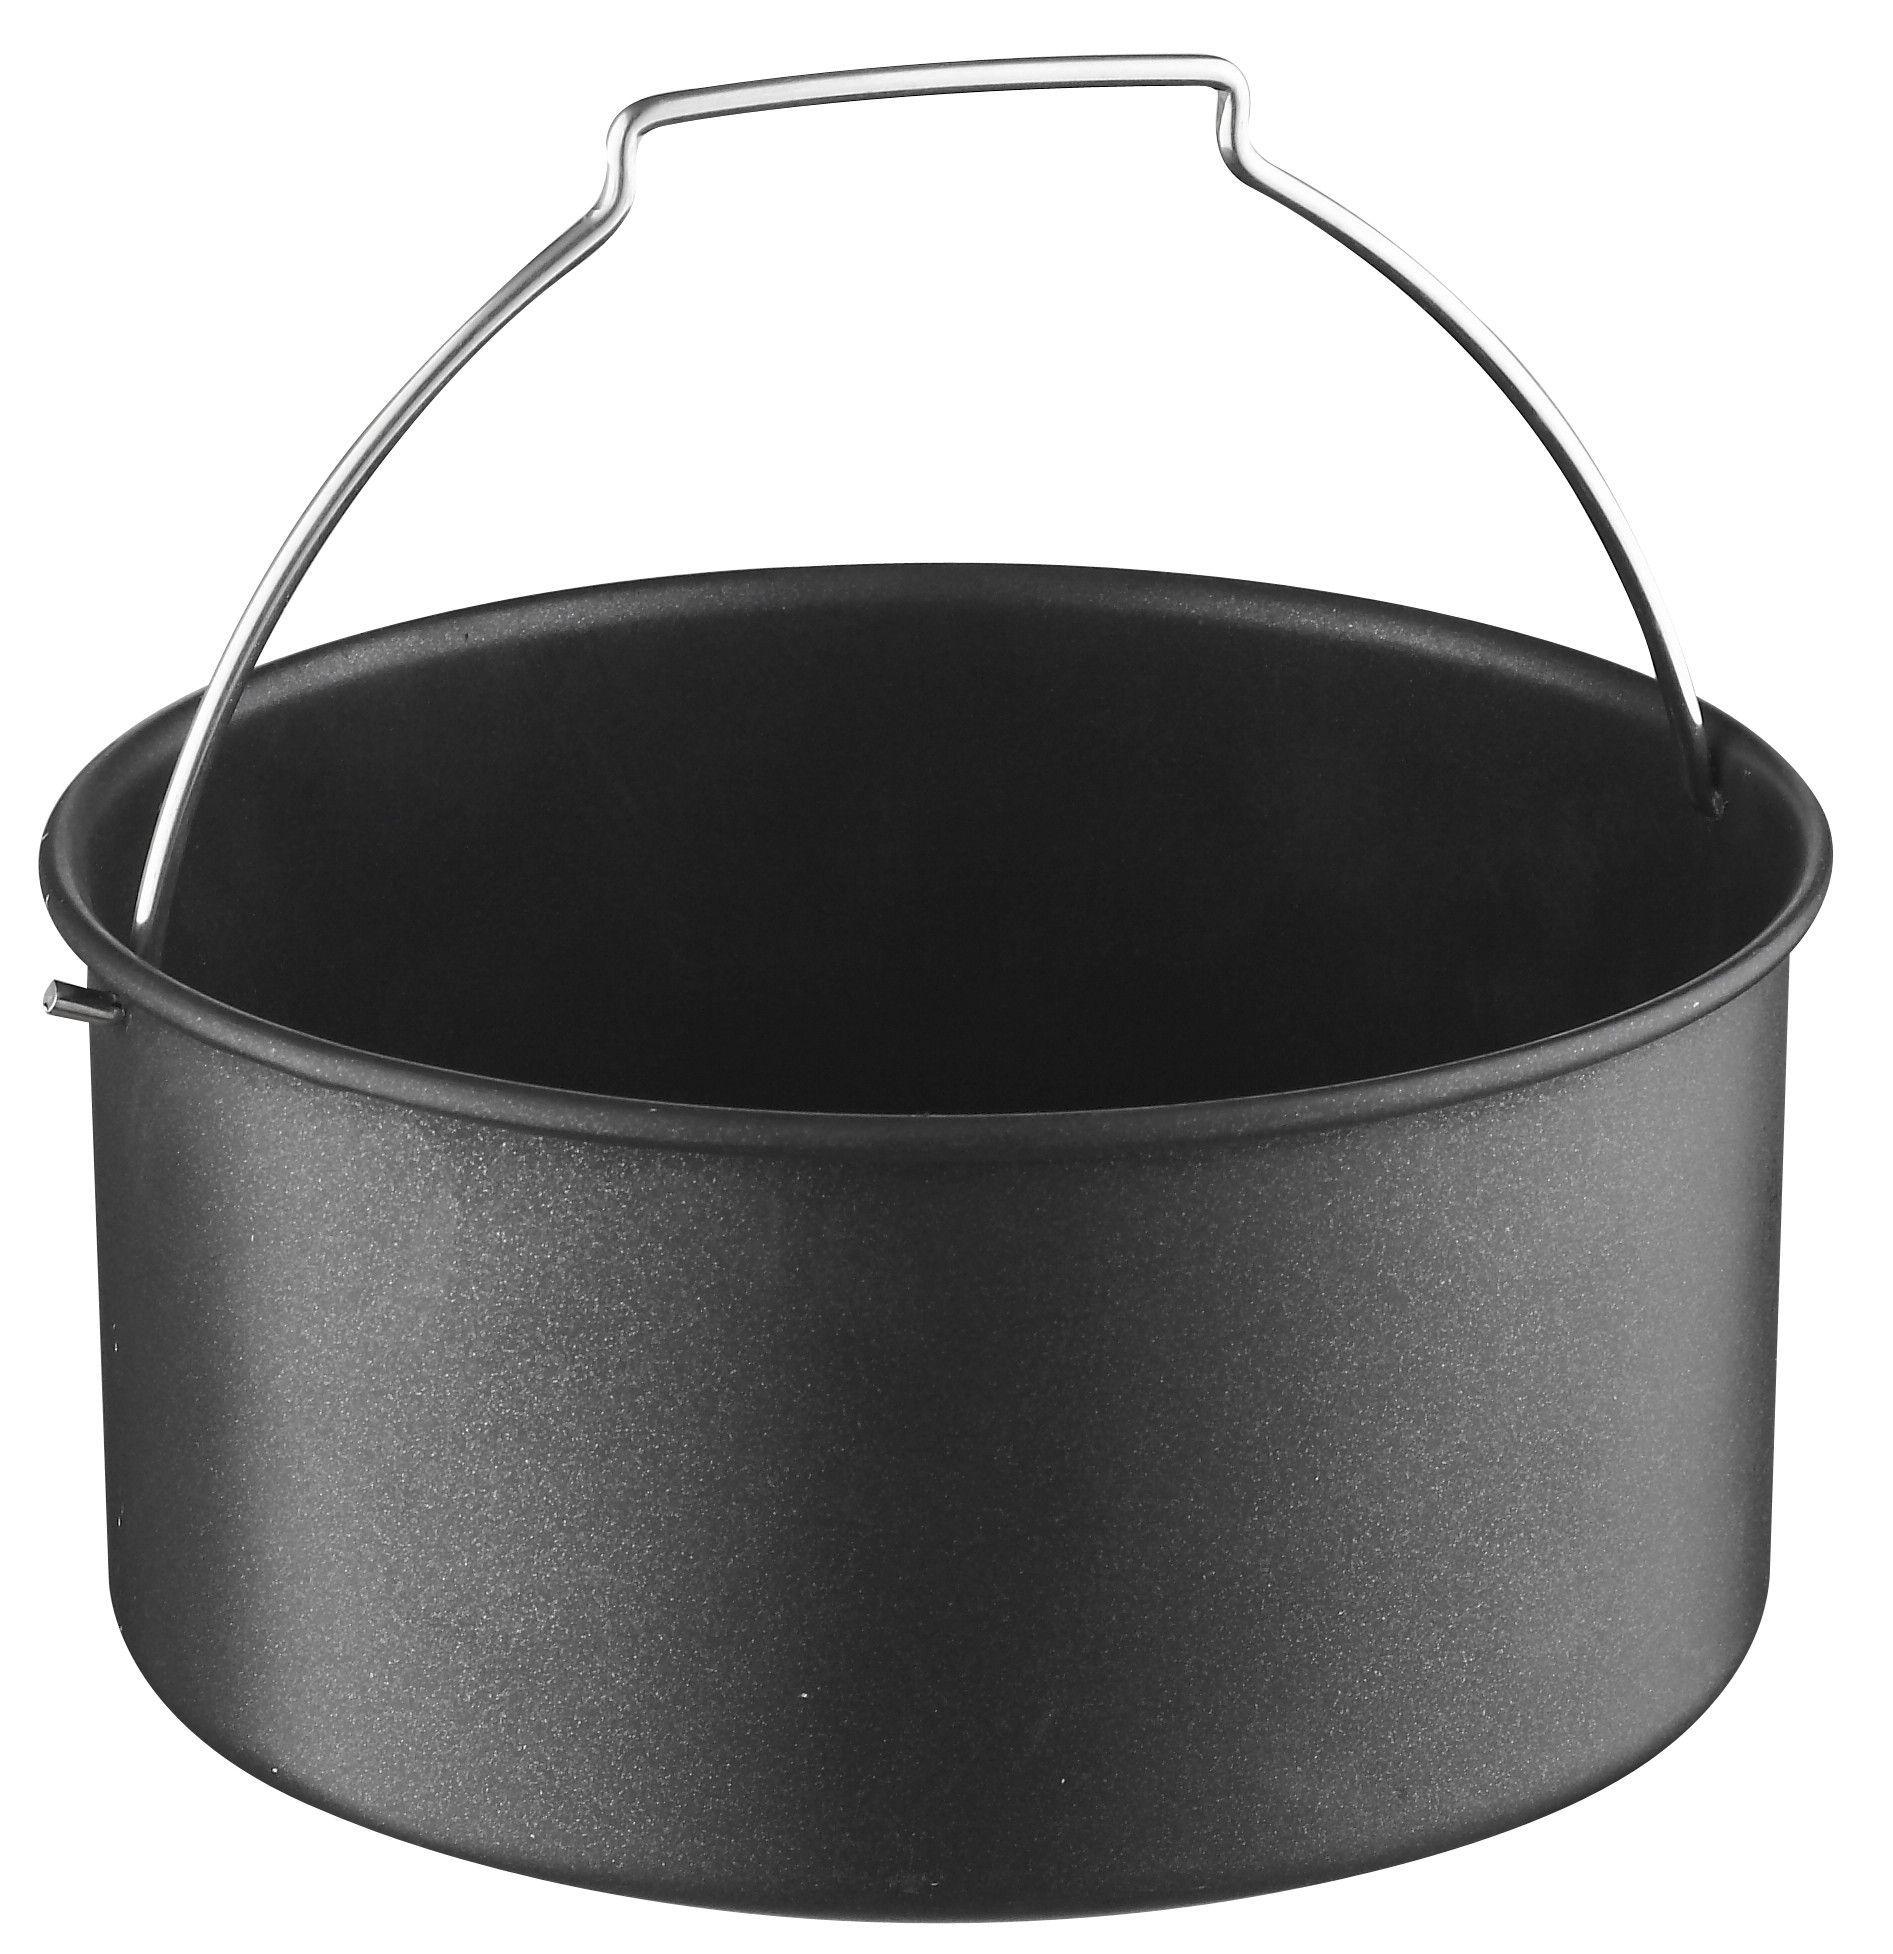 Air Fryer Non Stick Cake Baking Pan In 2019 Air Fryer